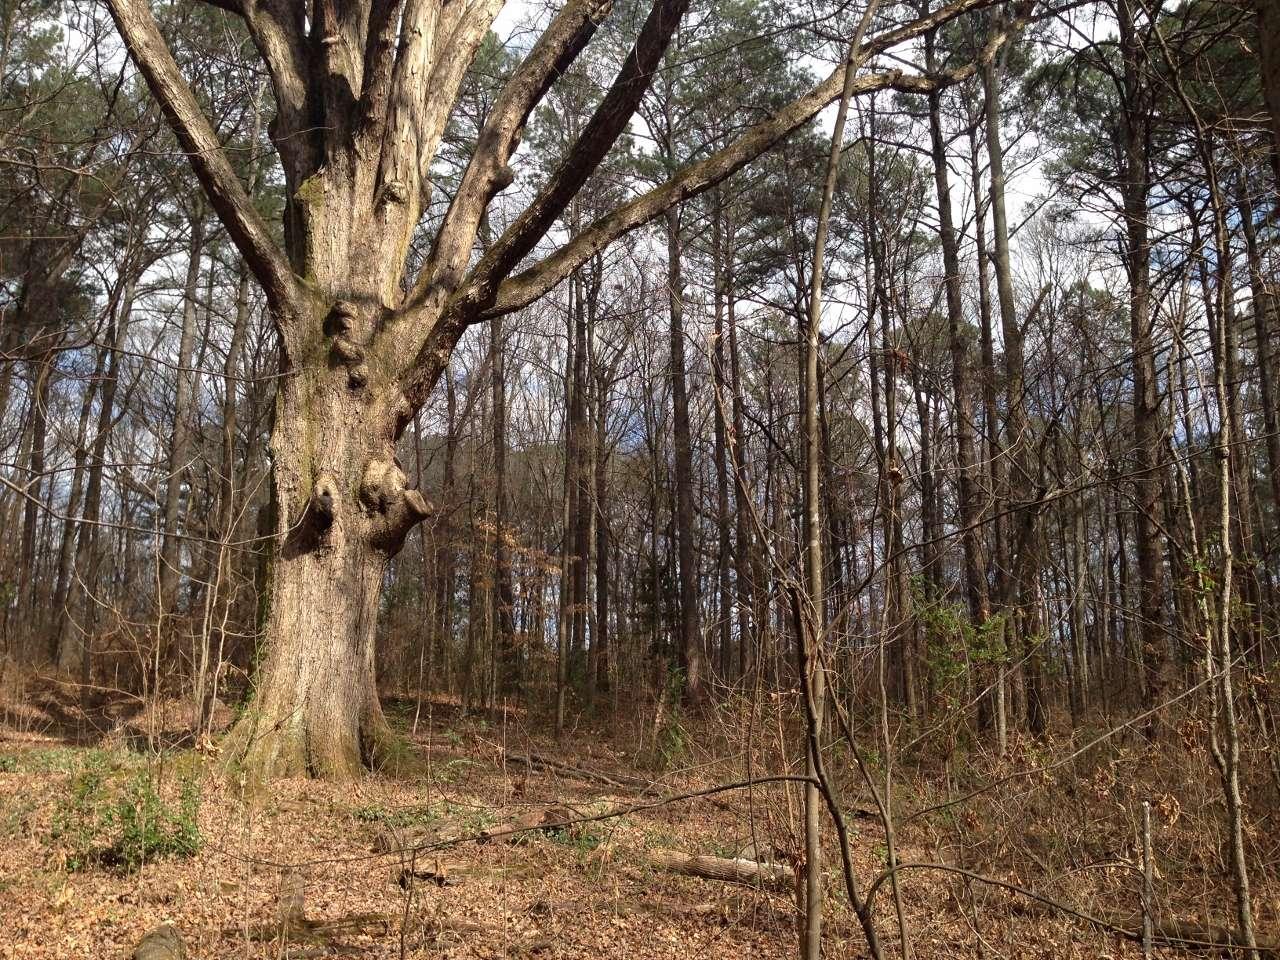 Winter Forest from Tsali Ghost Story Cherokee North Carolina